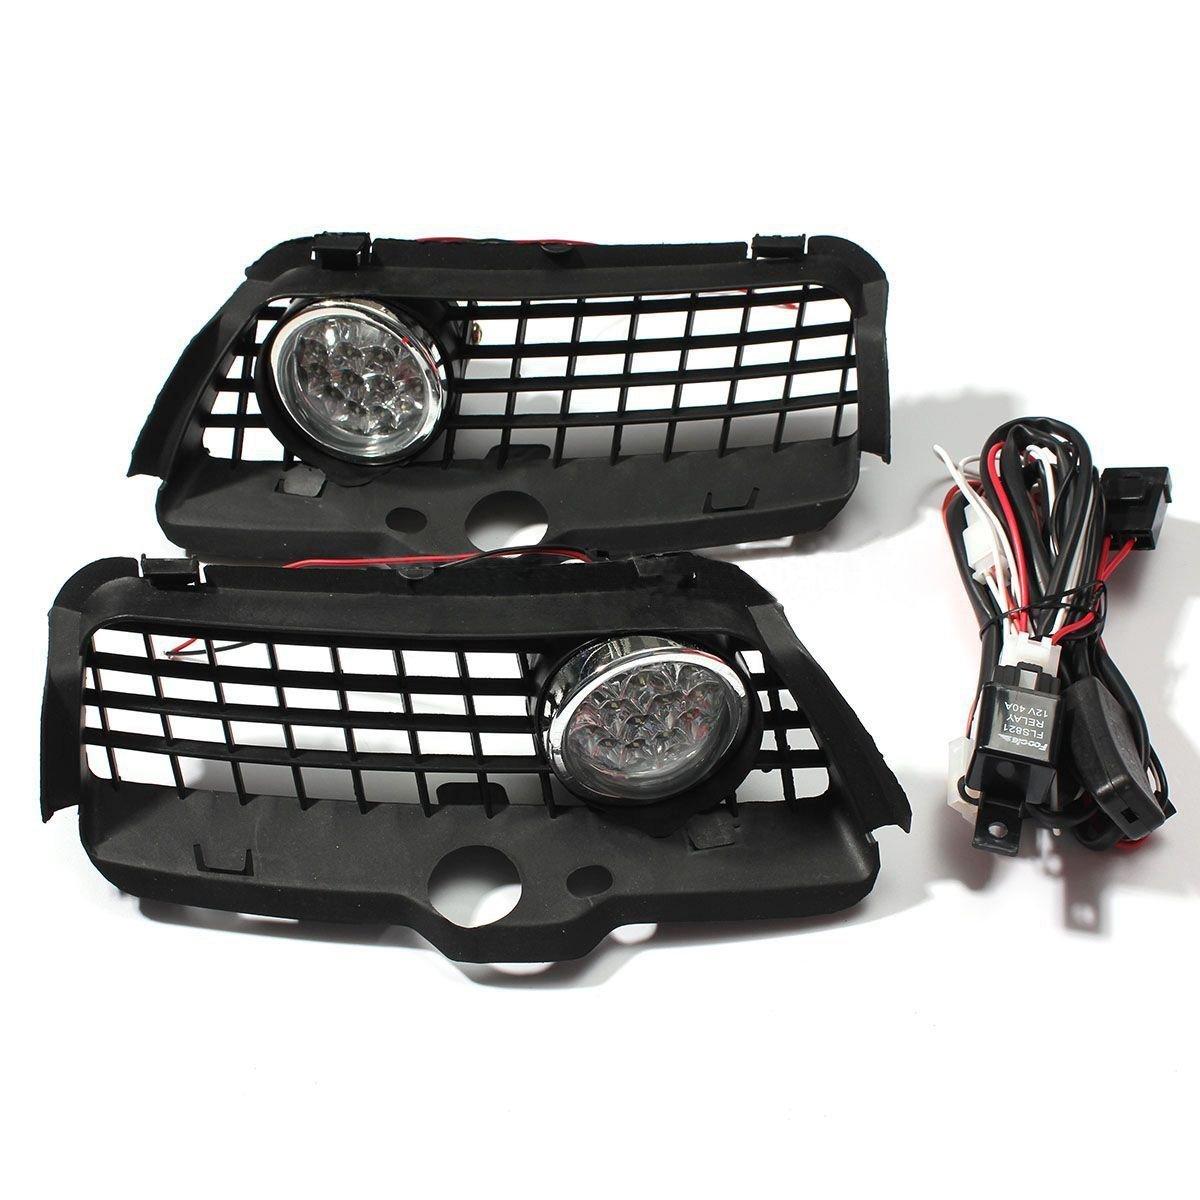 Sugeryy H3 55W LED Driving Fog Light Lamp Bulbs DRL Front Bumper Grille For VW MK3 Golf Jetta 92-98 1992-1998